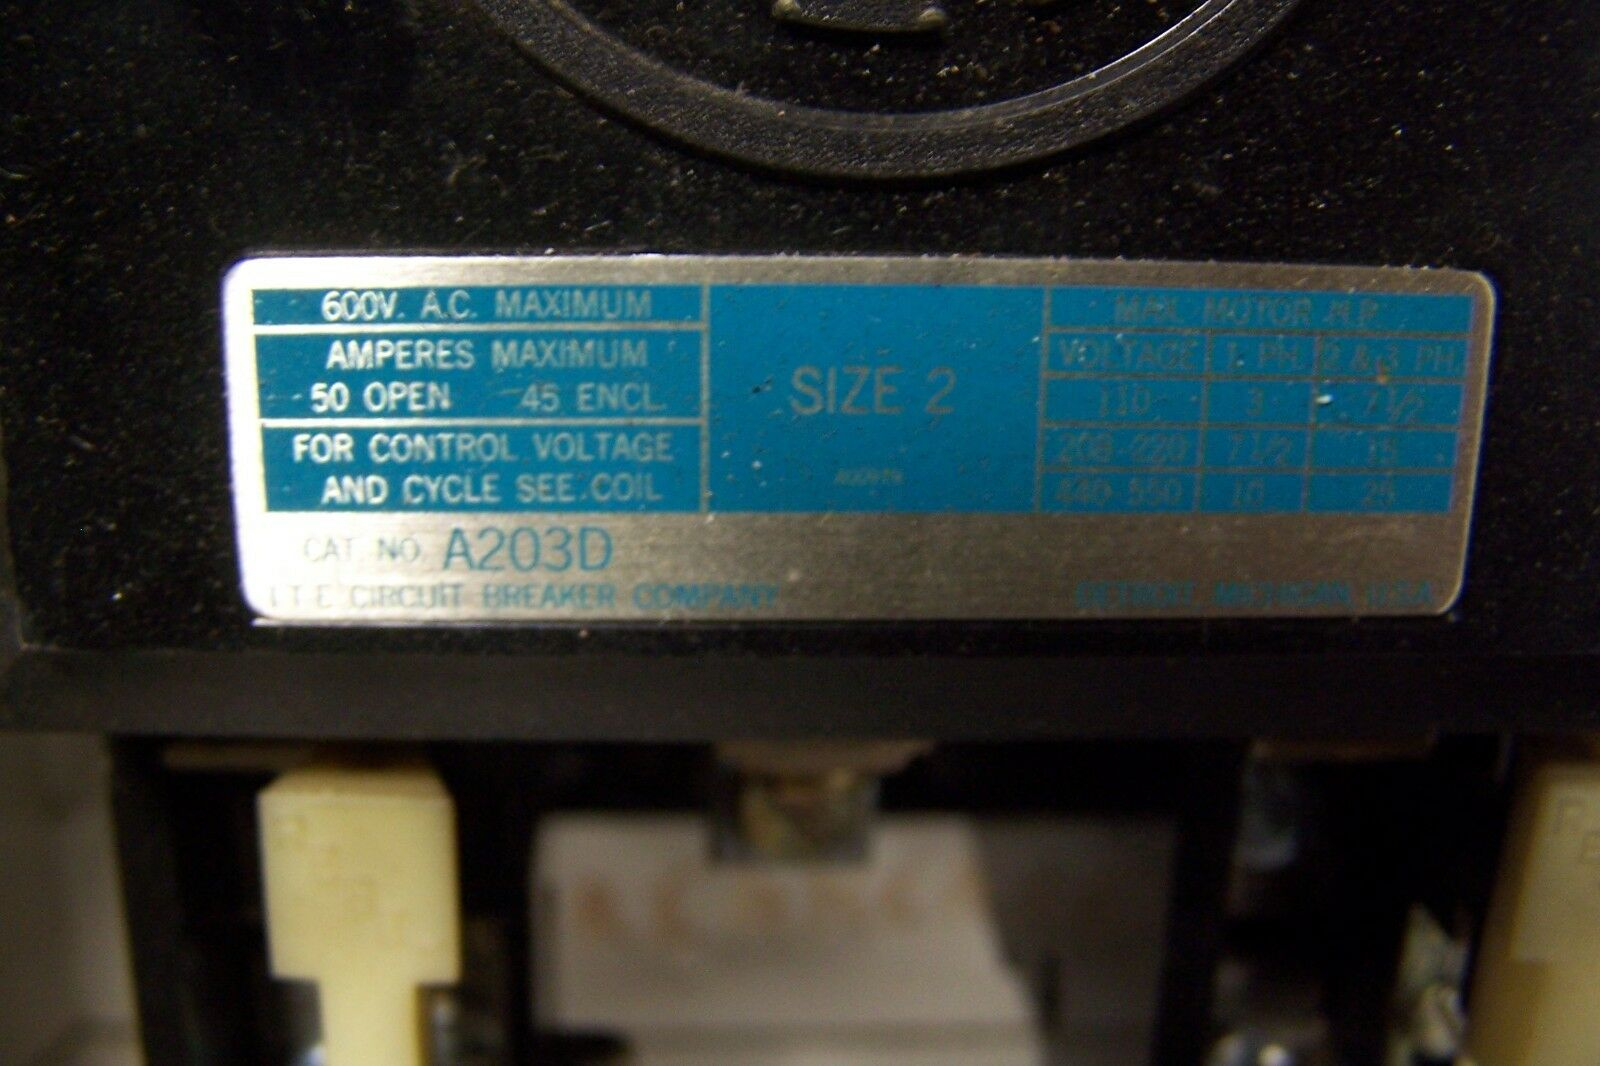 A203d Control Wiring Diagram. . Wiring Diagram on